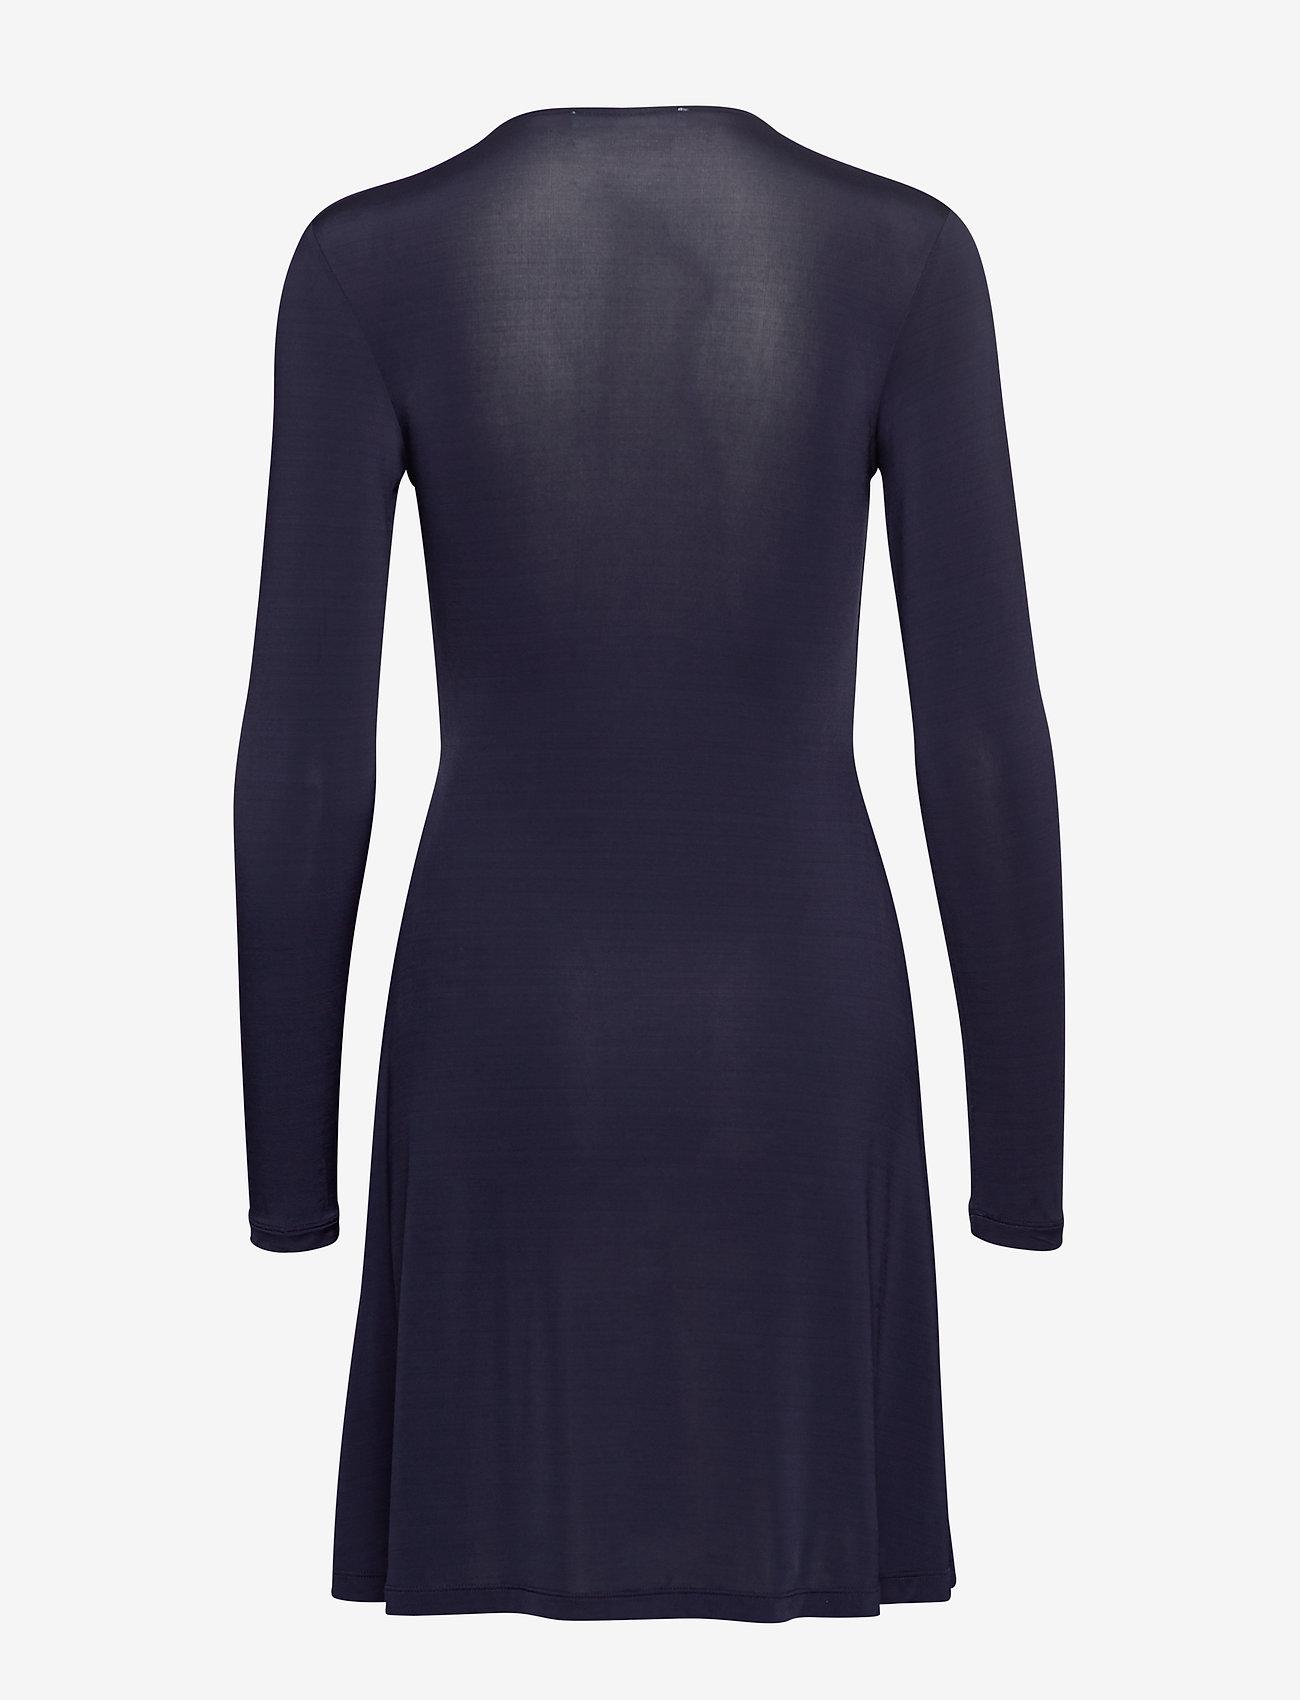 Elsi Short Dress 10908 (Night Sky) - Samsøe Samsøe OLsDAo